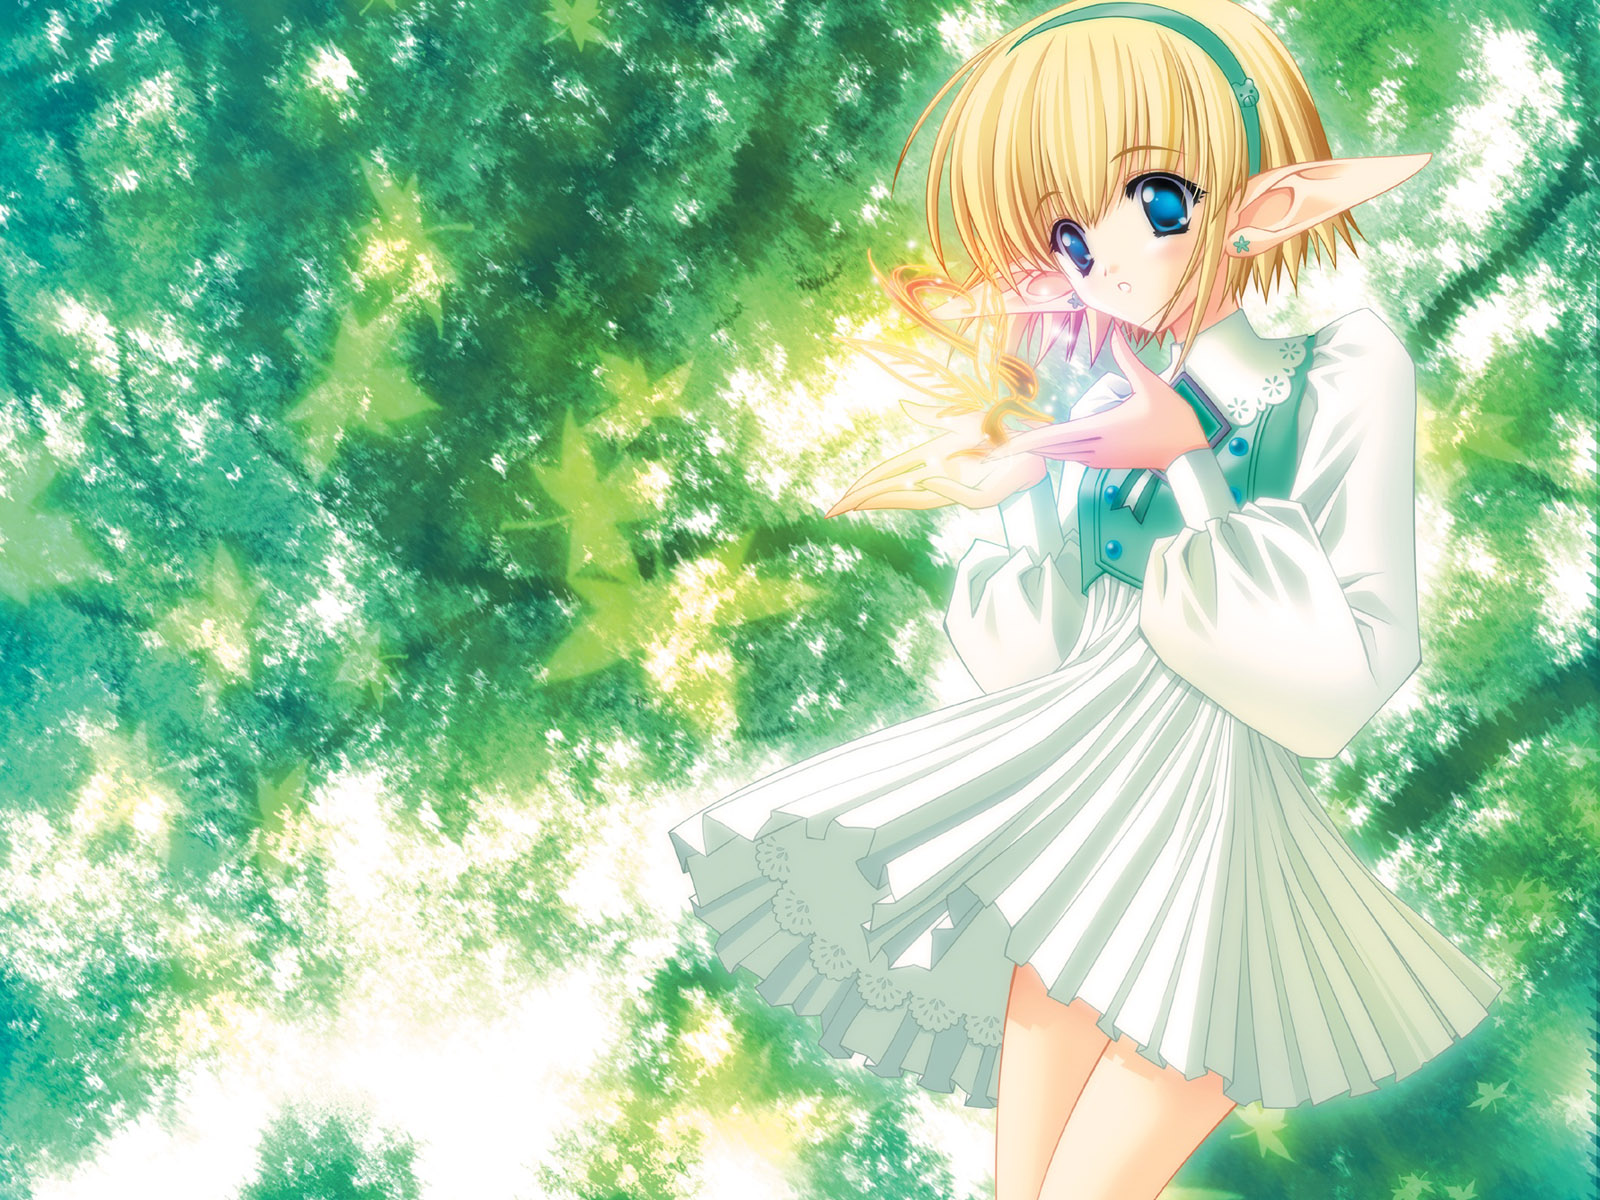 Of Unexpected Side: Dibujos animados de chicas lindas - Anime girls ...